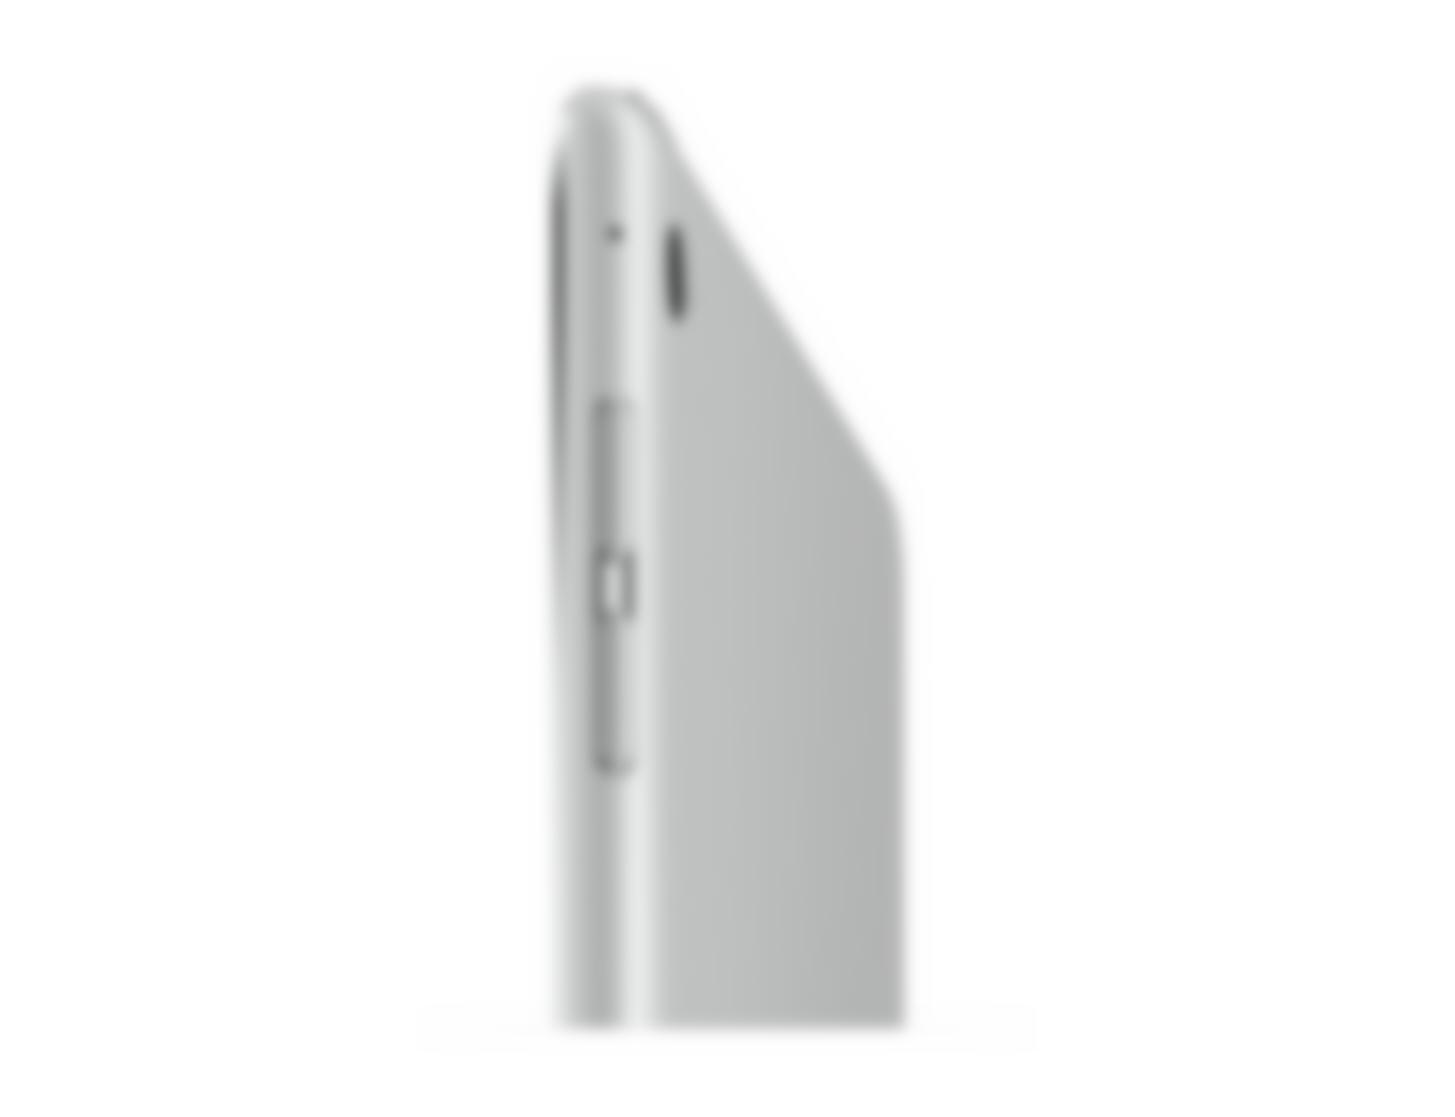 iPad Mini 4 gallery 5